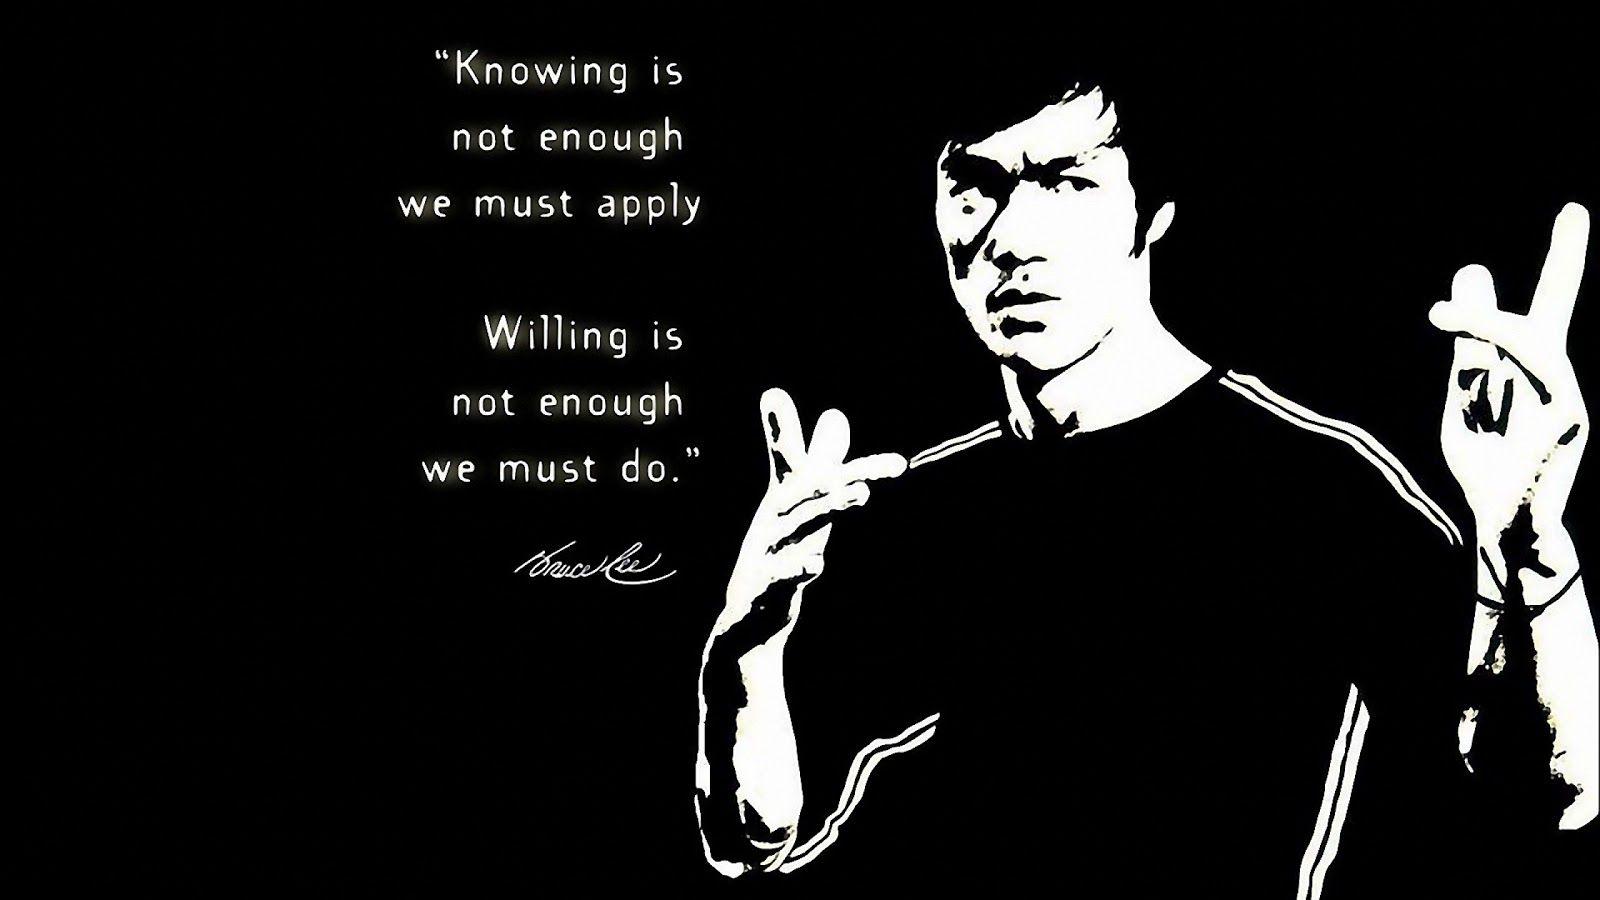 Taekwondo Quotes Motivational Quotes For Martial Artists  Gomartial Martial Arts Zone